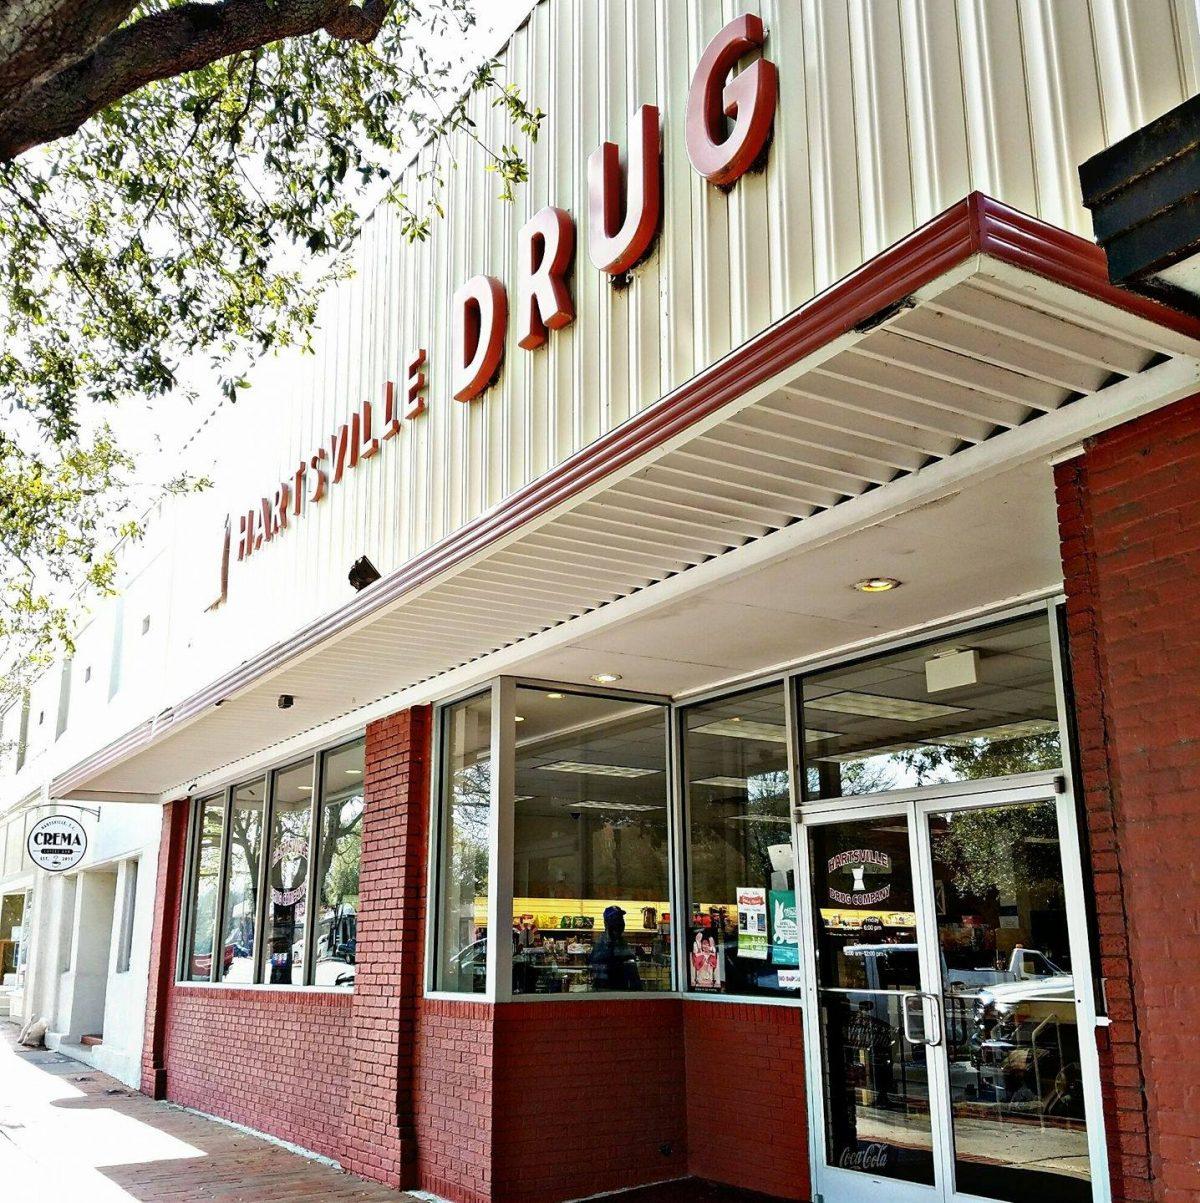 The Hartsville Drug Company Storefront on West Carolina Ave.